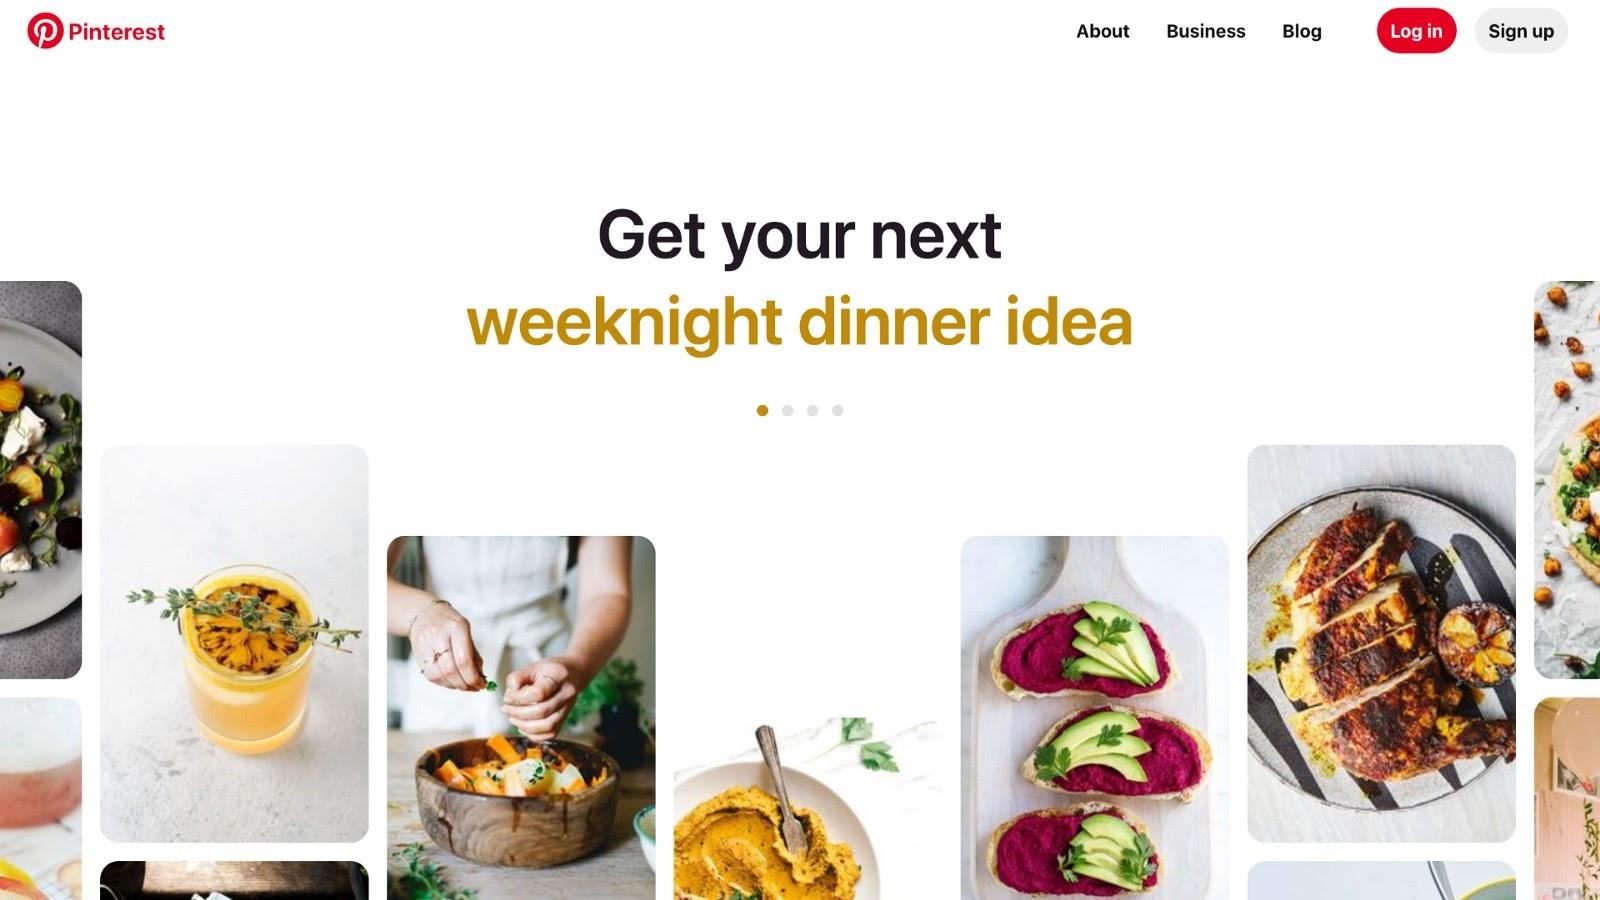 Example of a social media website (Pinterest.com)